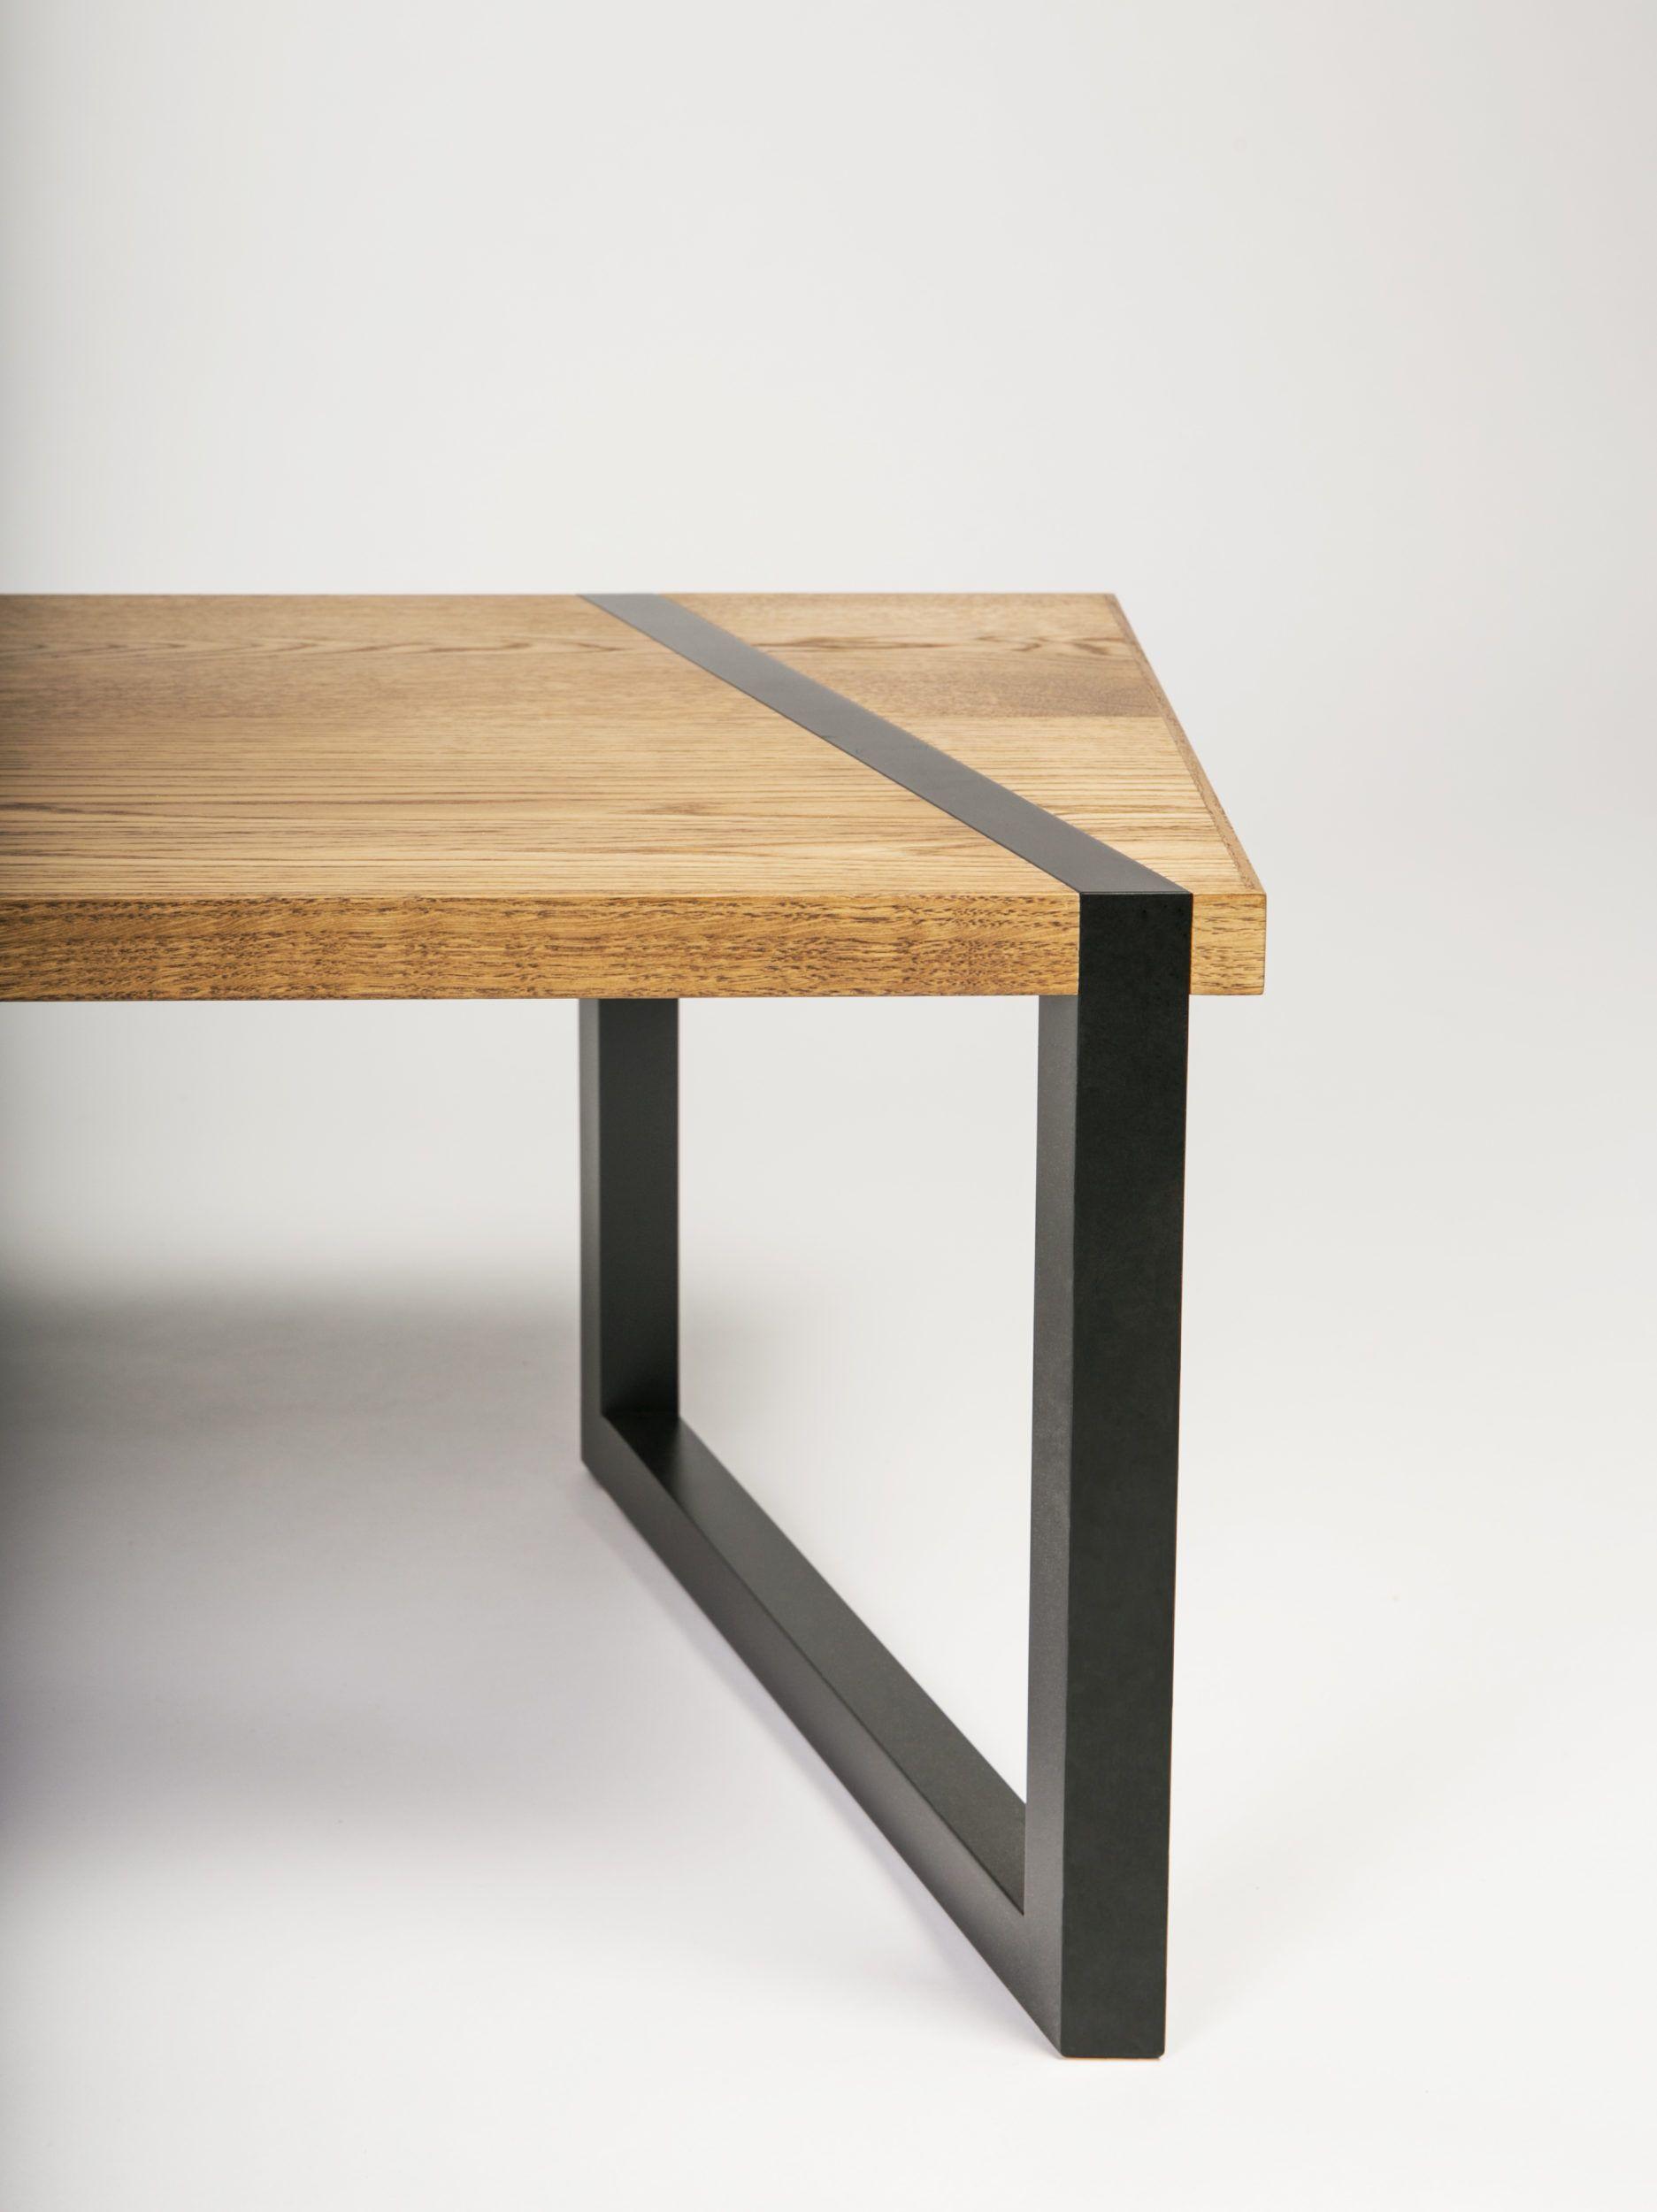 Bespoke Coffee Table With Angled Legs Handmade Oak Coffee Table Wooden Coffee Table Designs Coffee Table Wood Coffee Table Inspiration [ 1695 x 600 Pixel ]